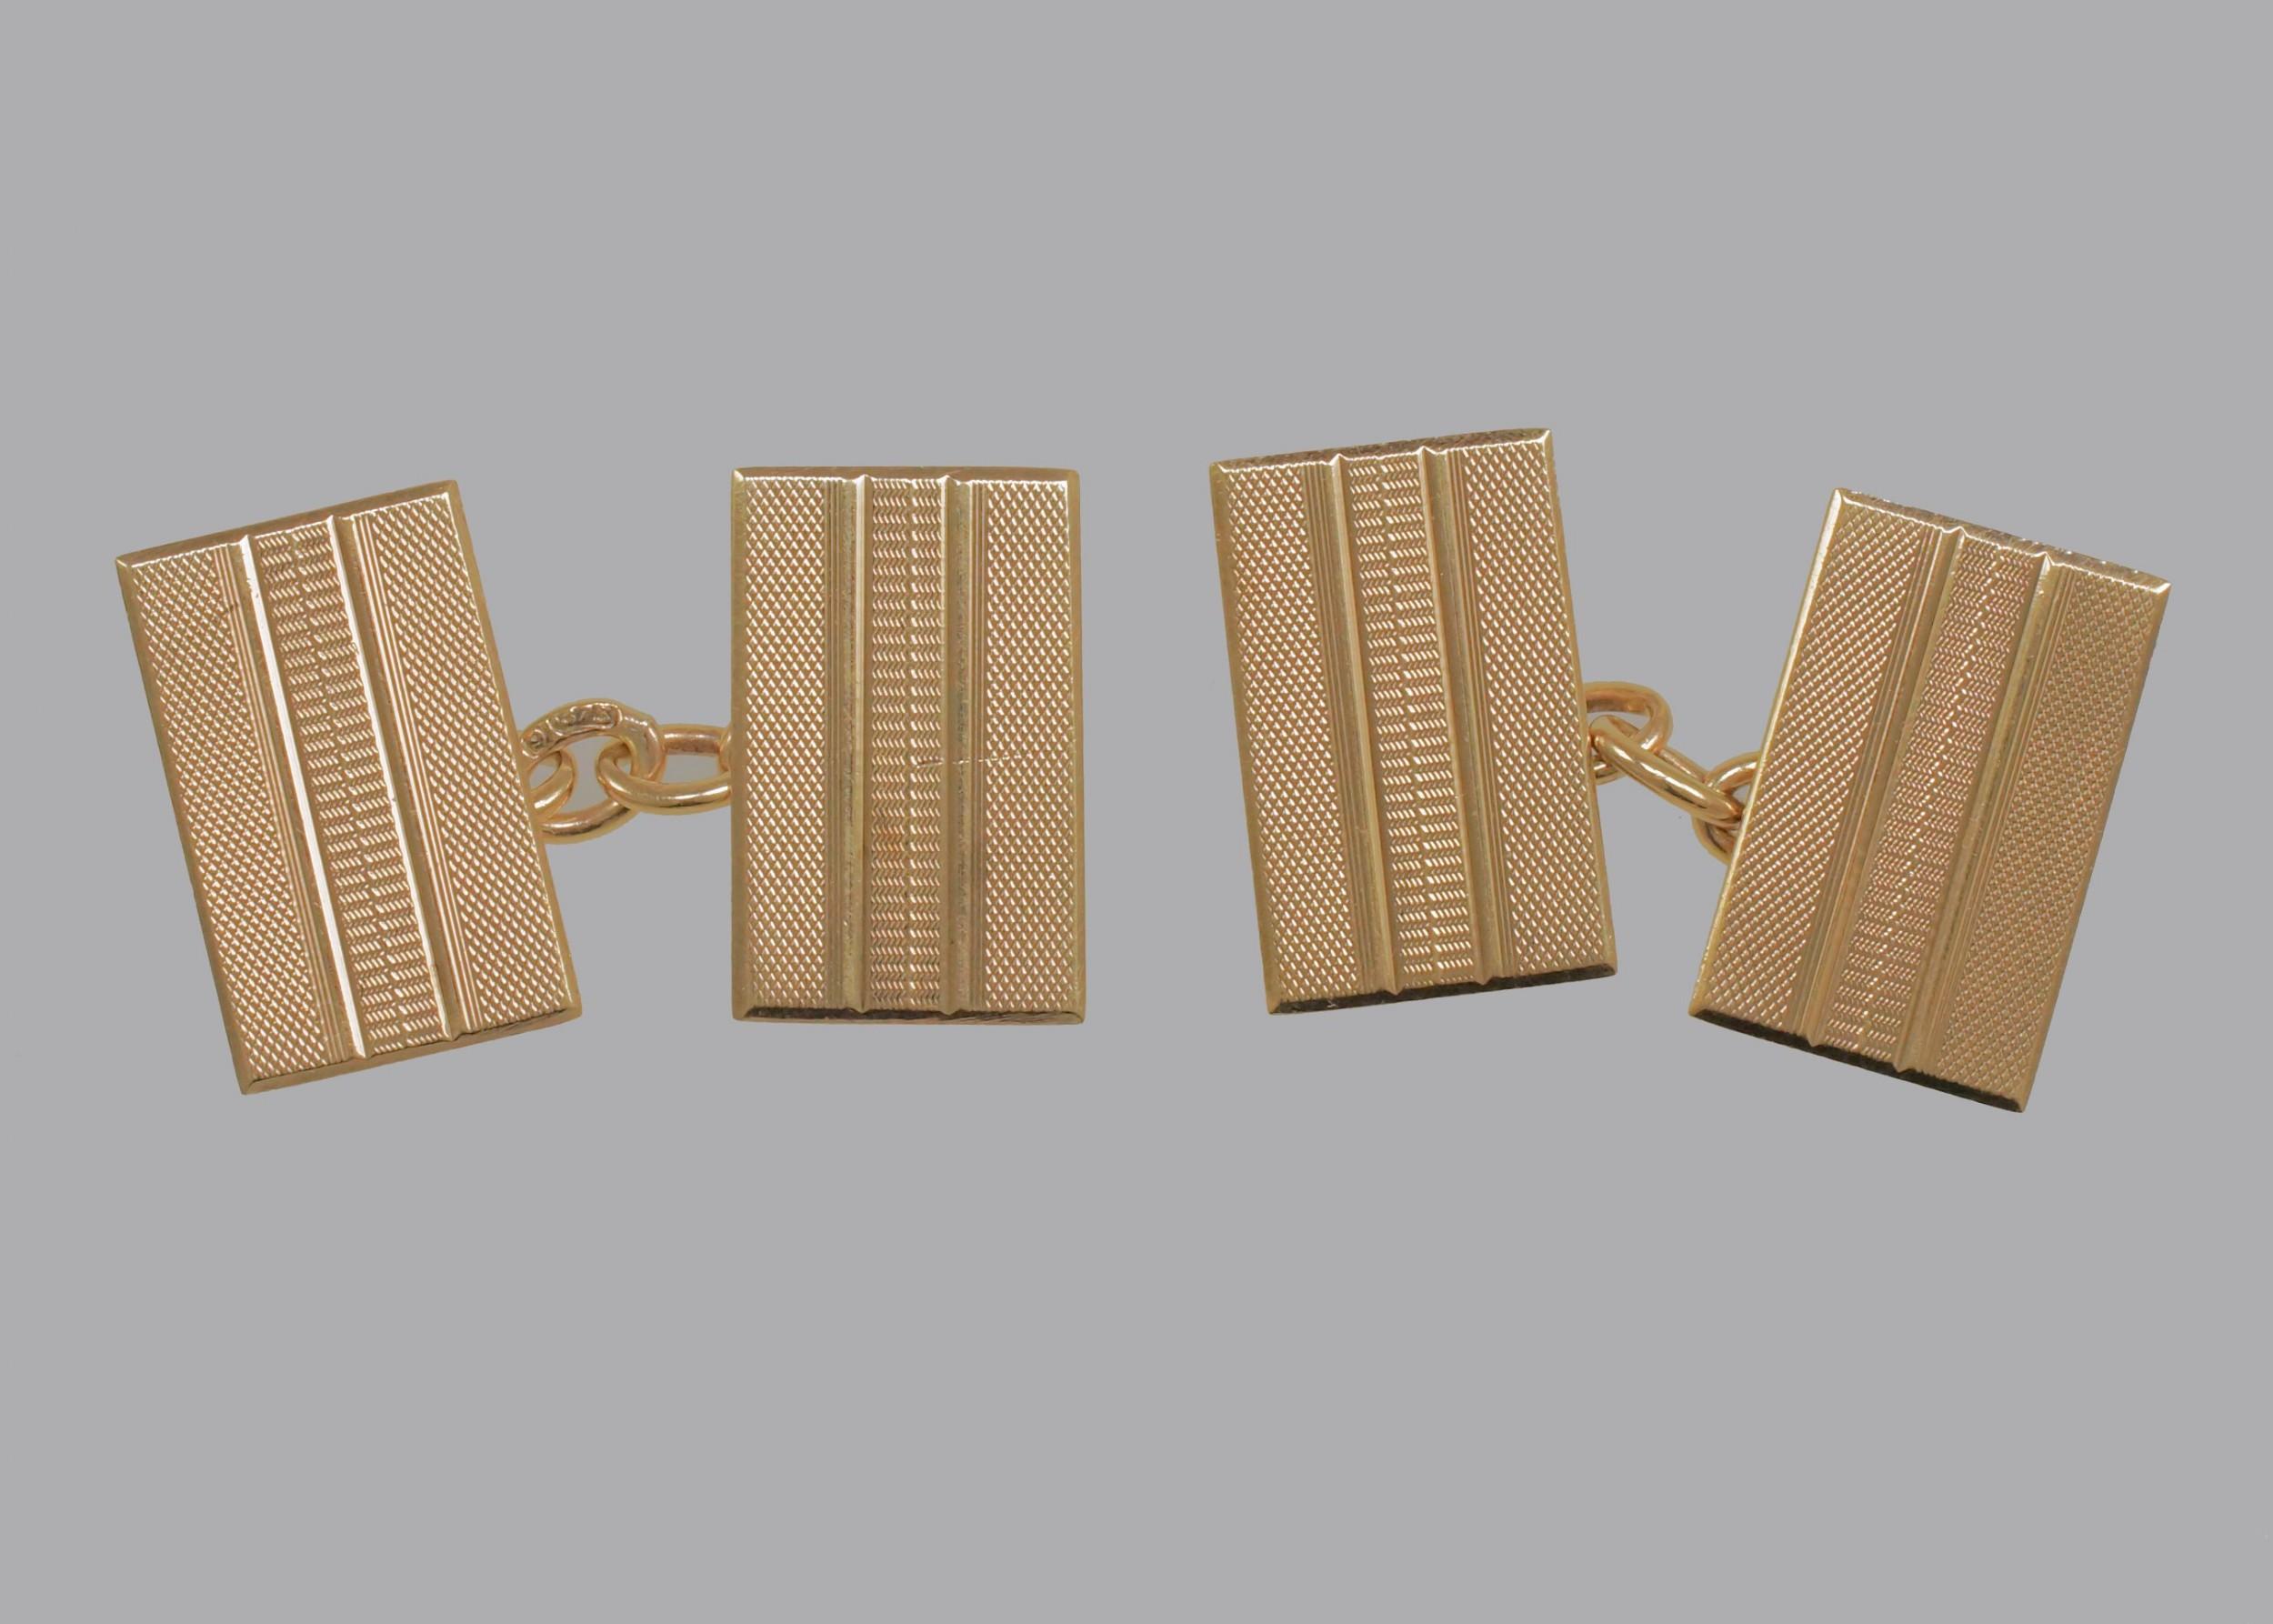 art deco cufflinks 9ct gold hallmarked chester 1939 engine turned cuff links